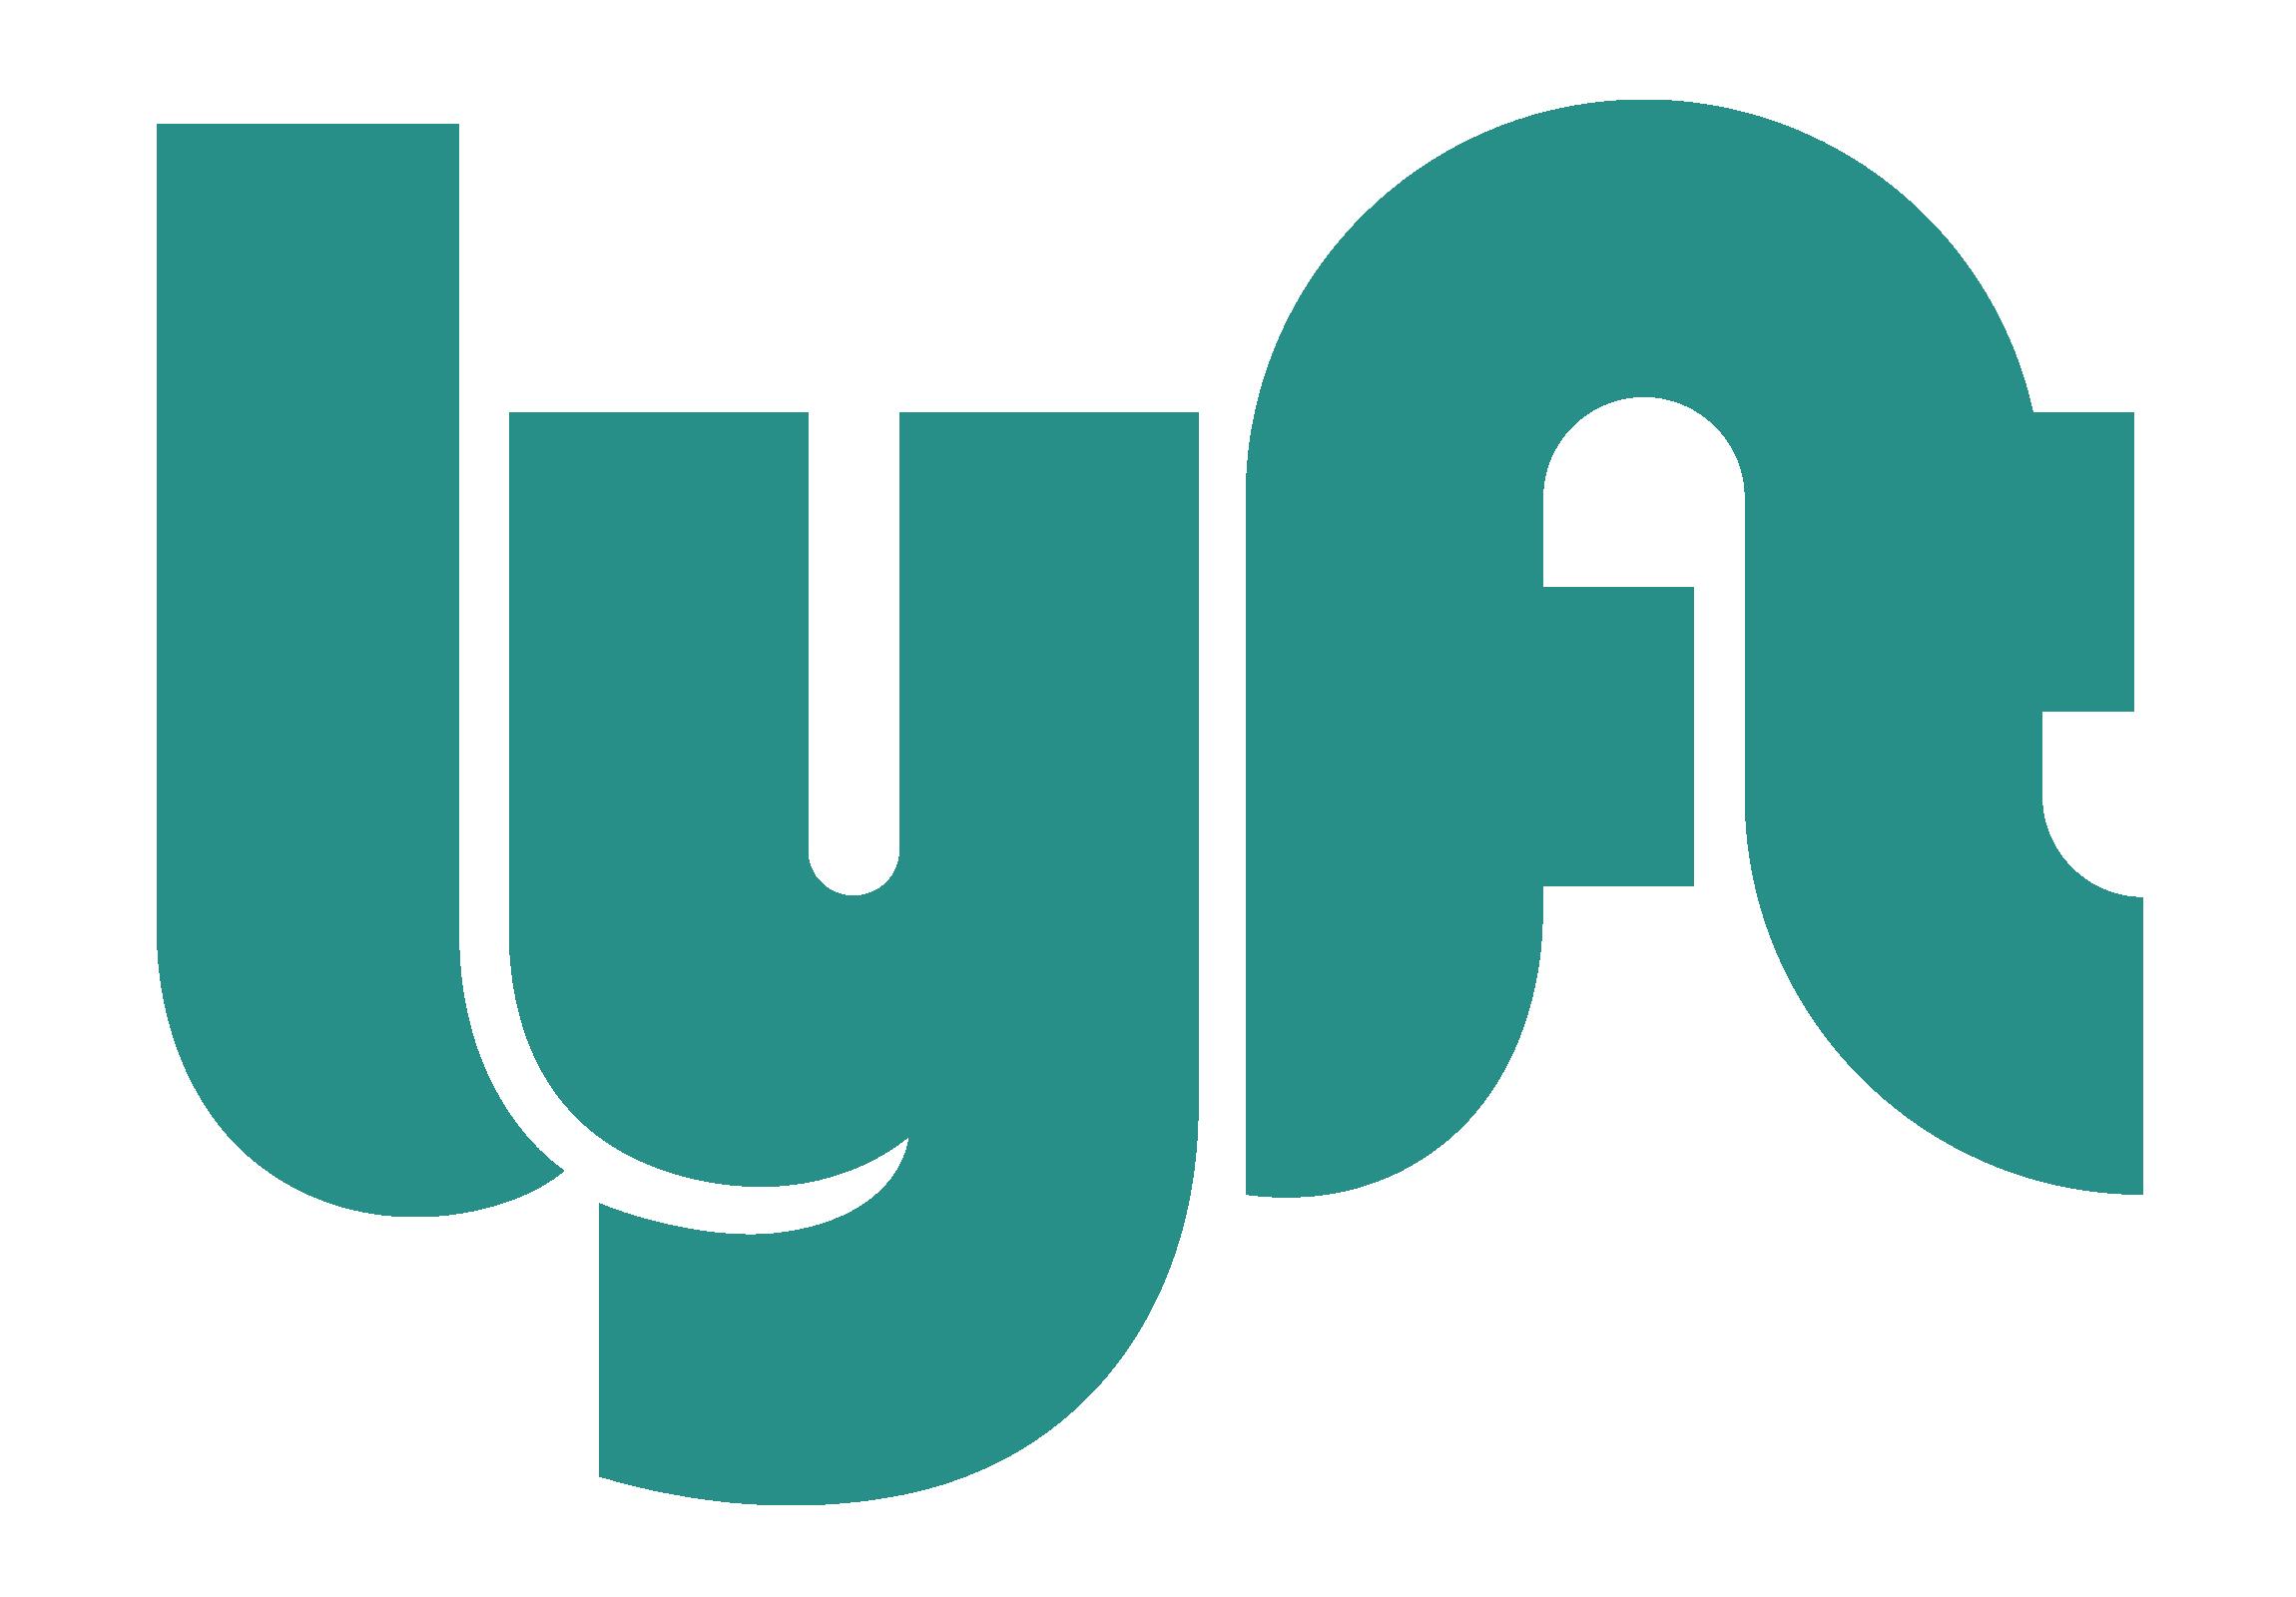 photograph about Printable Lyft Emblem named Lyft Emblem Pictures - Opposite Glimpse